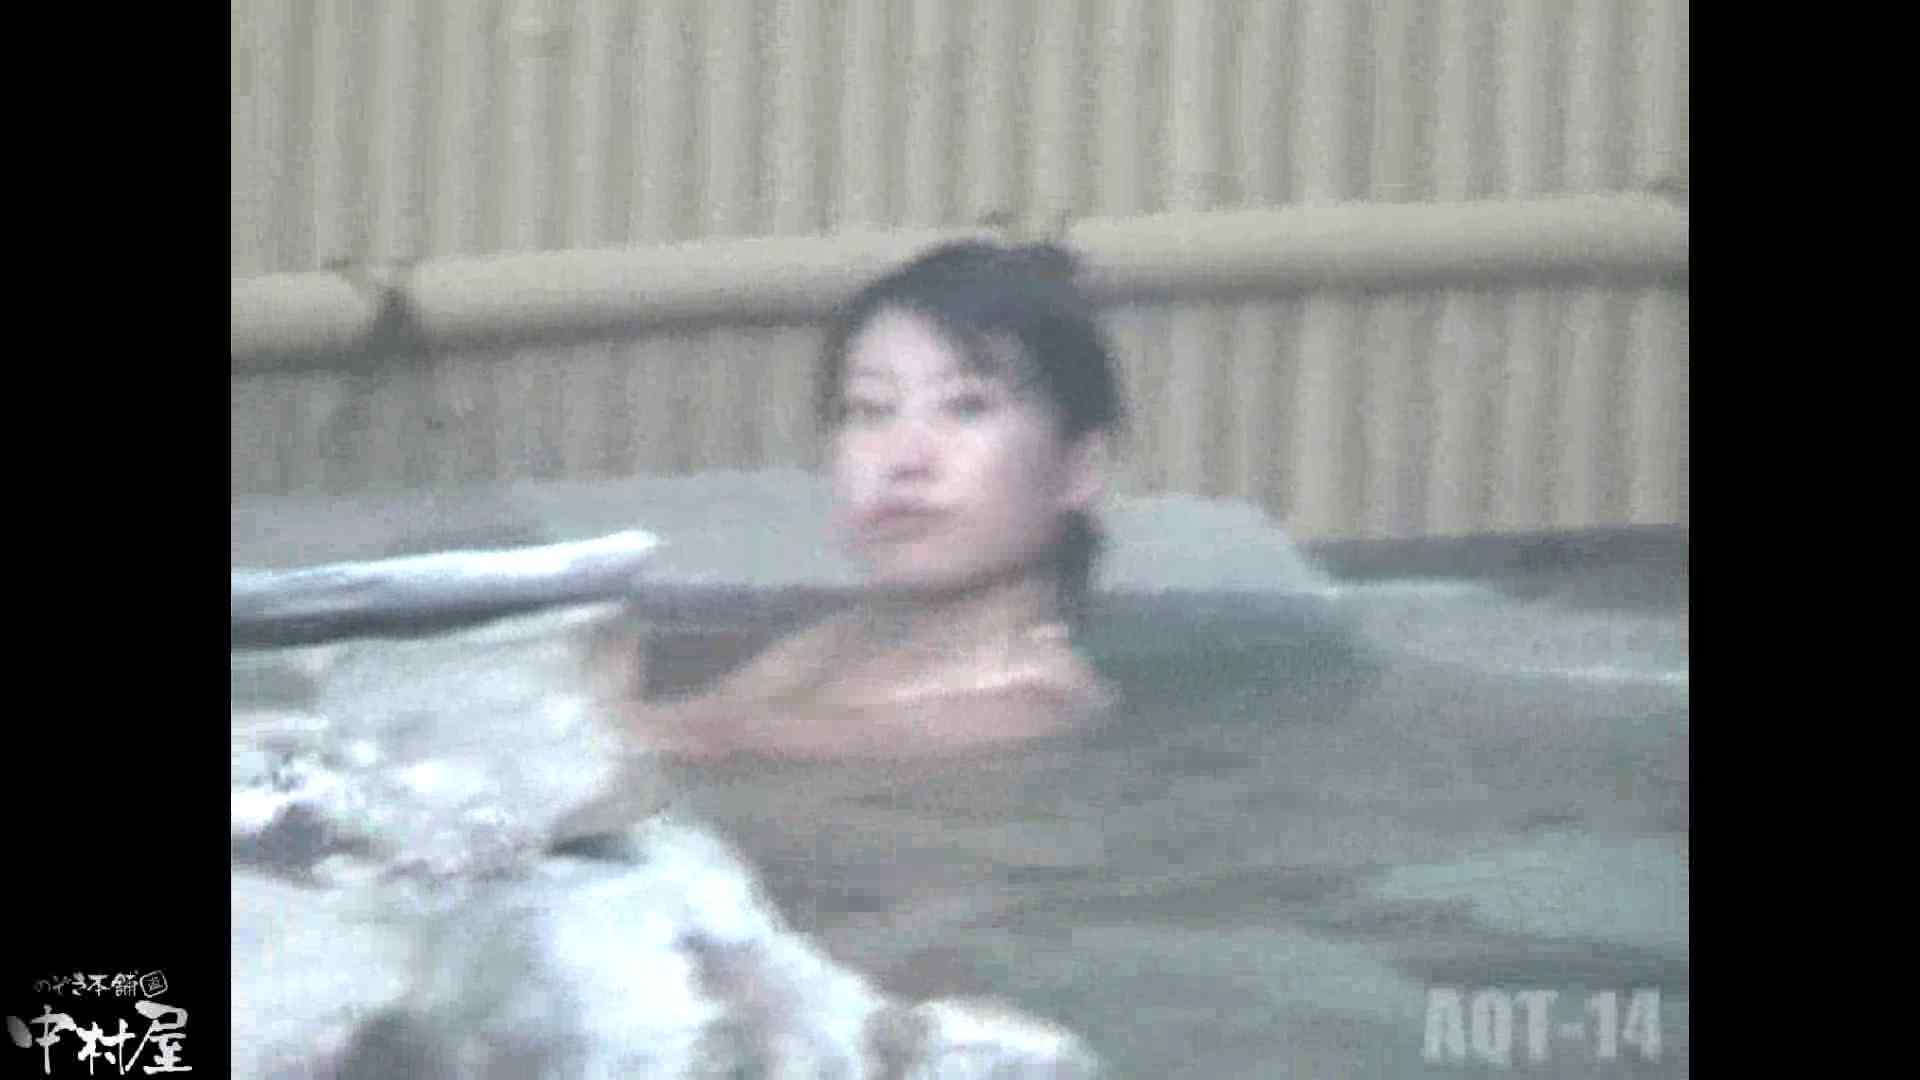 Aquaな露天風呂Vol.878潜入盗撮露天風呂十四判湯 其の一 潜入画像   露天  59画像 16